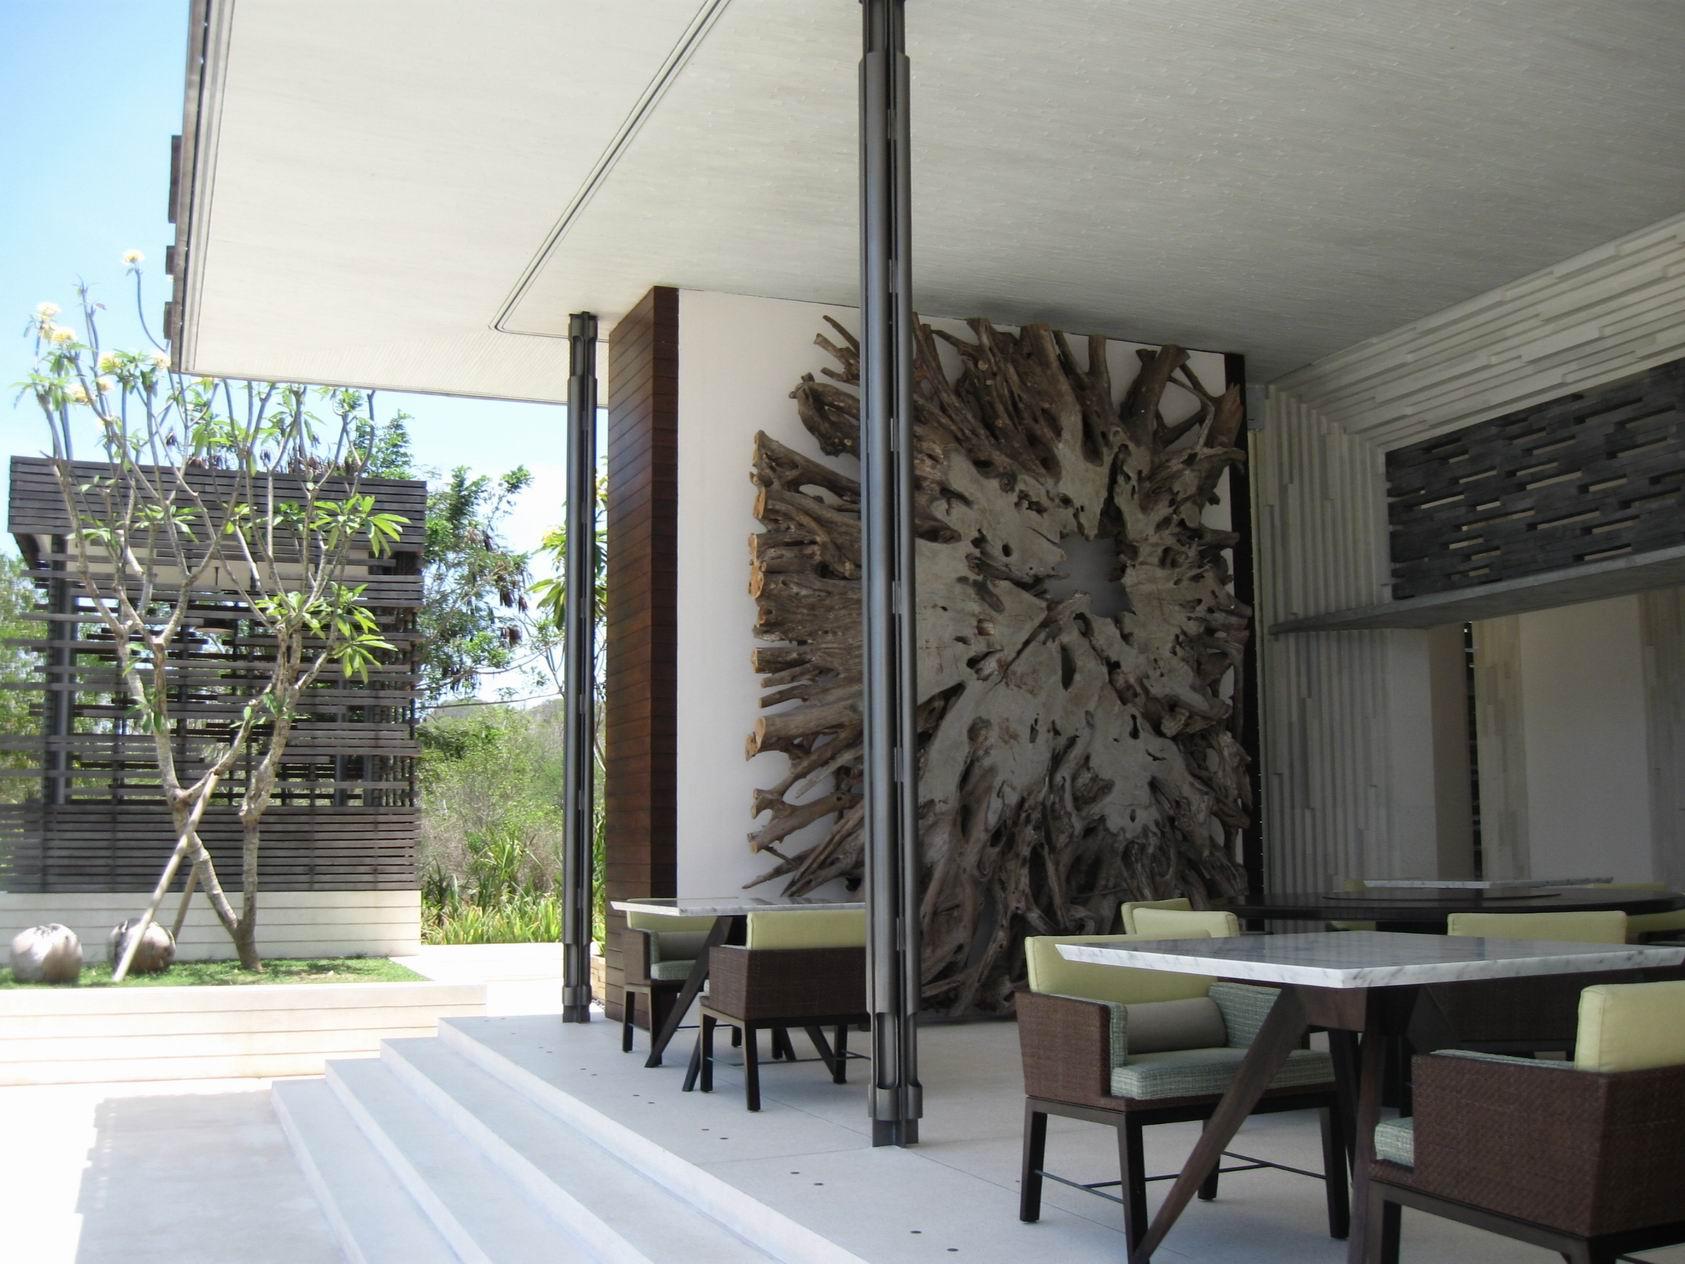 3p巴厘岛度假酒店之旅--搭送新加坡动物园_家在深圳